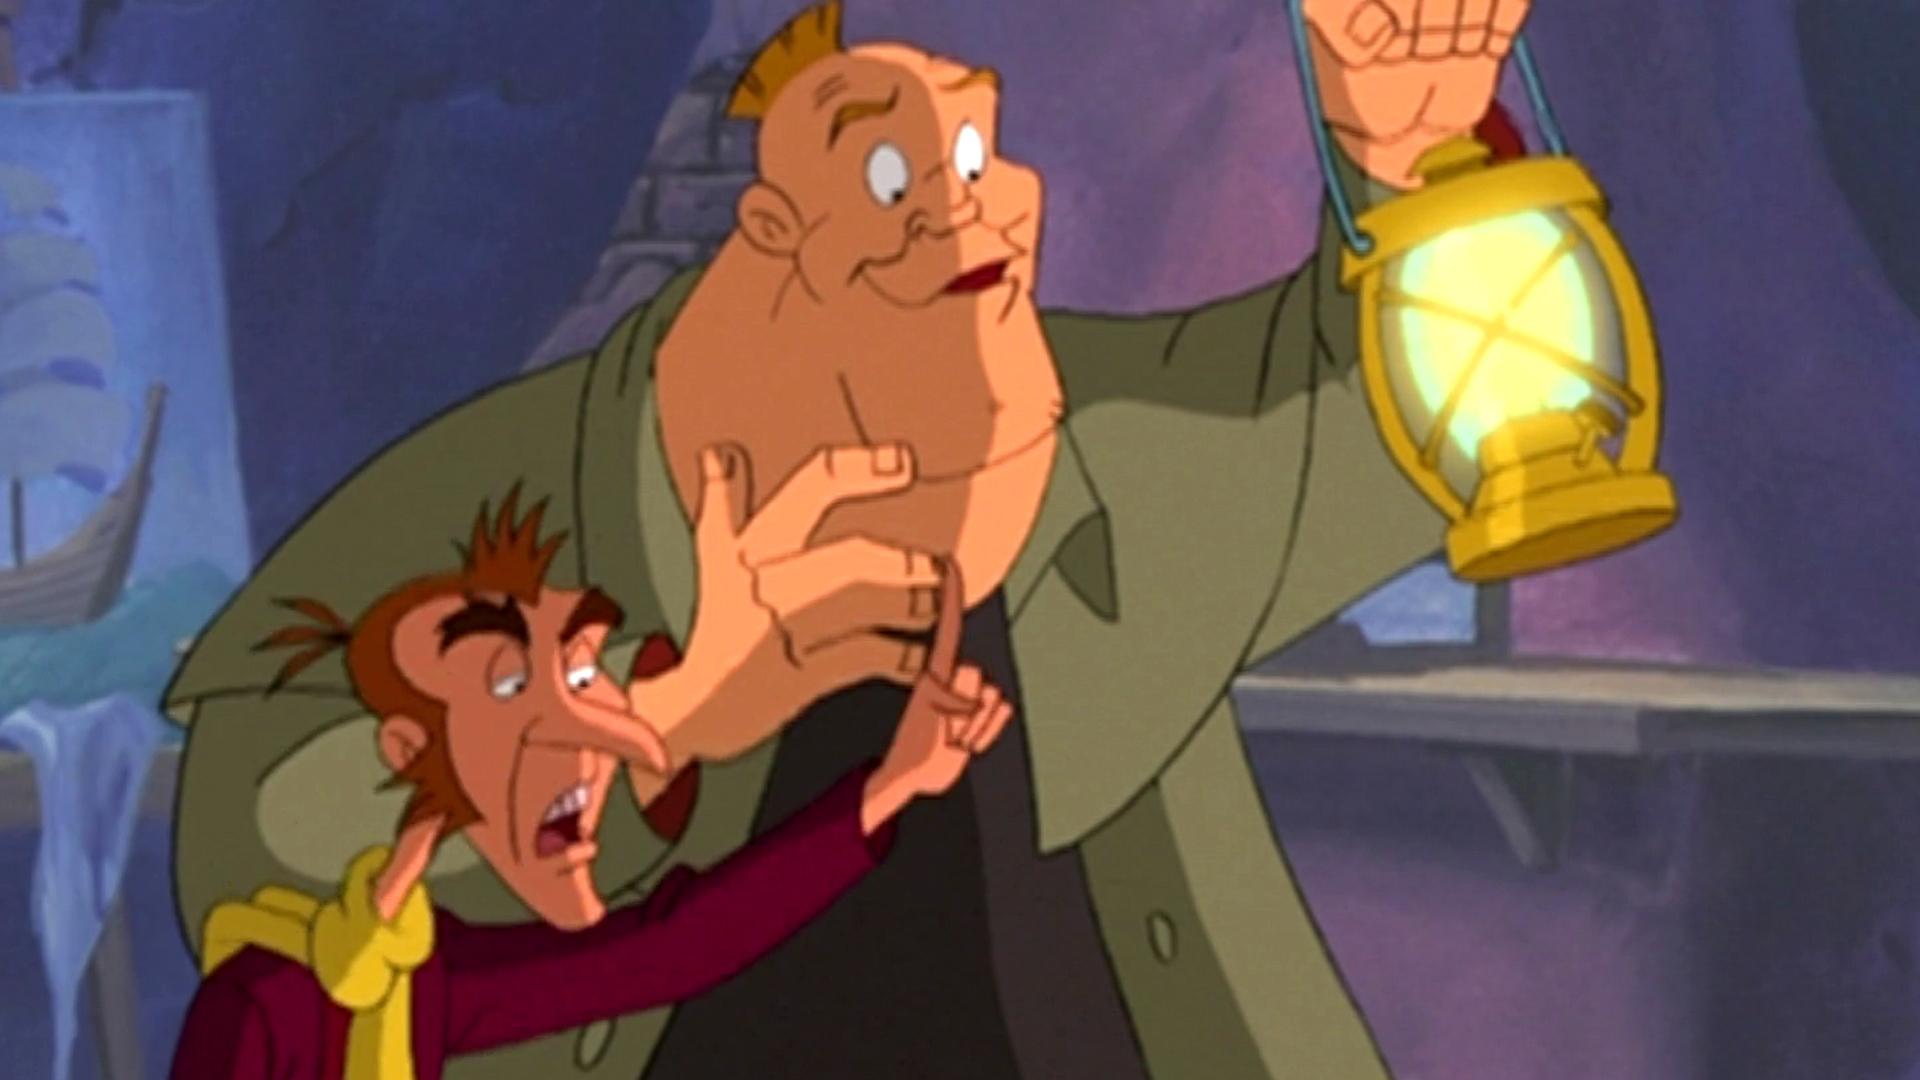 Temporada 1 Capítulo 2: Pippi recibe a dos ladrones